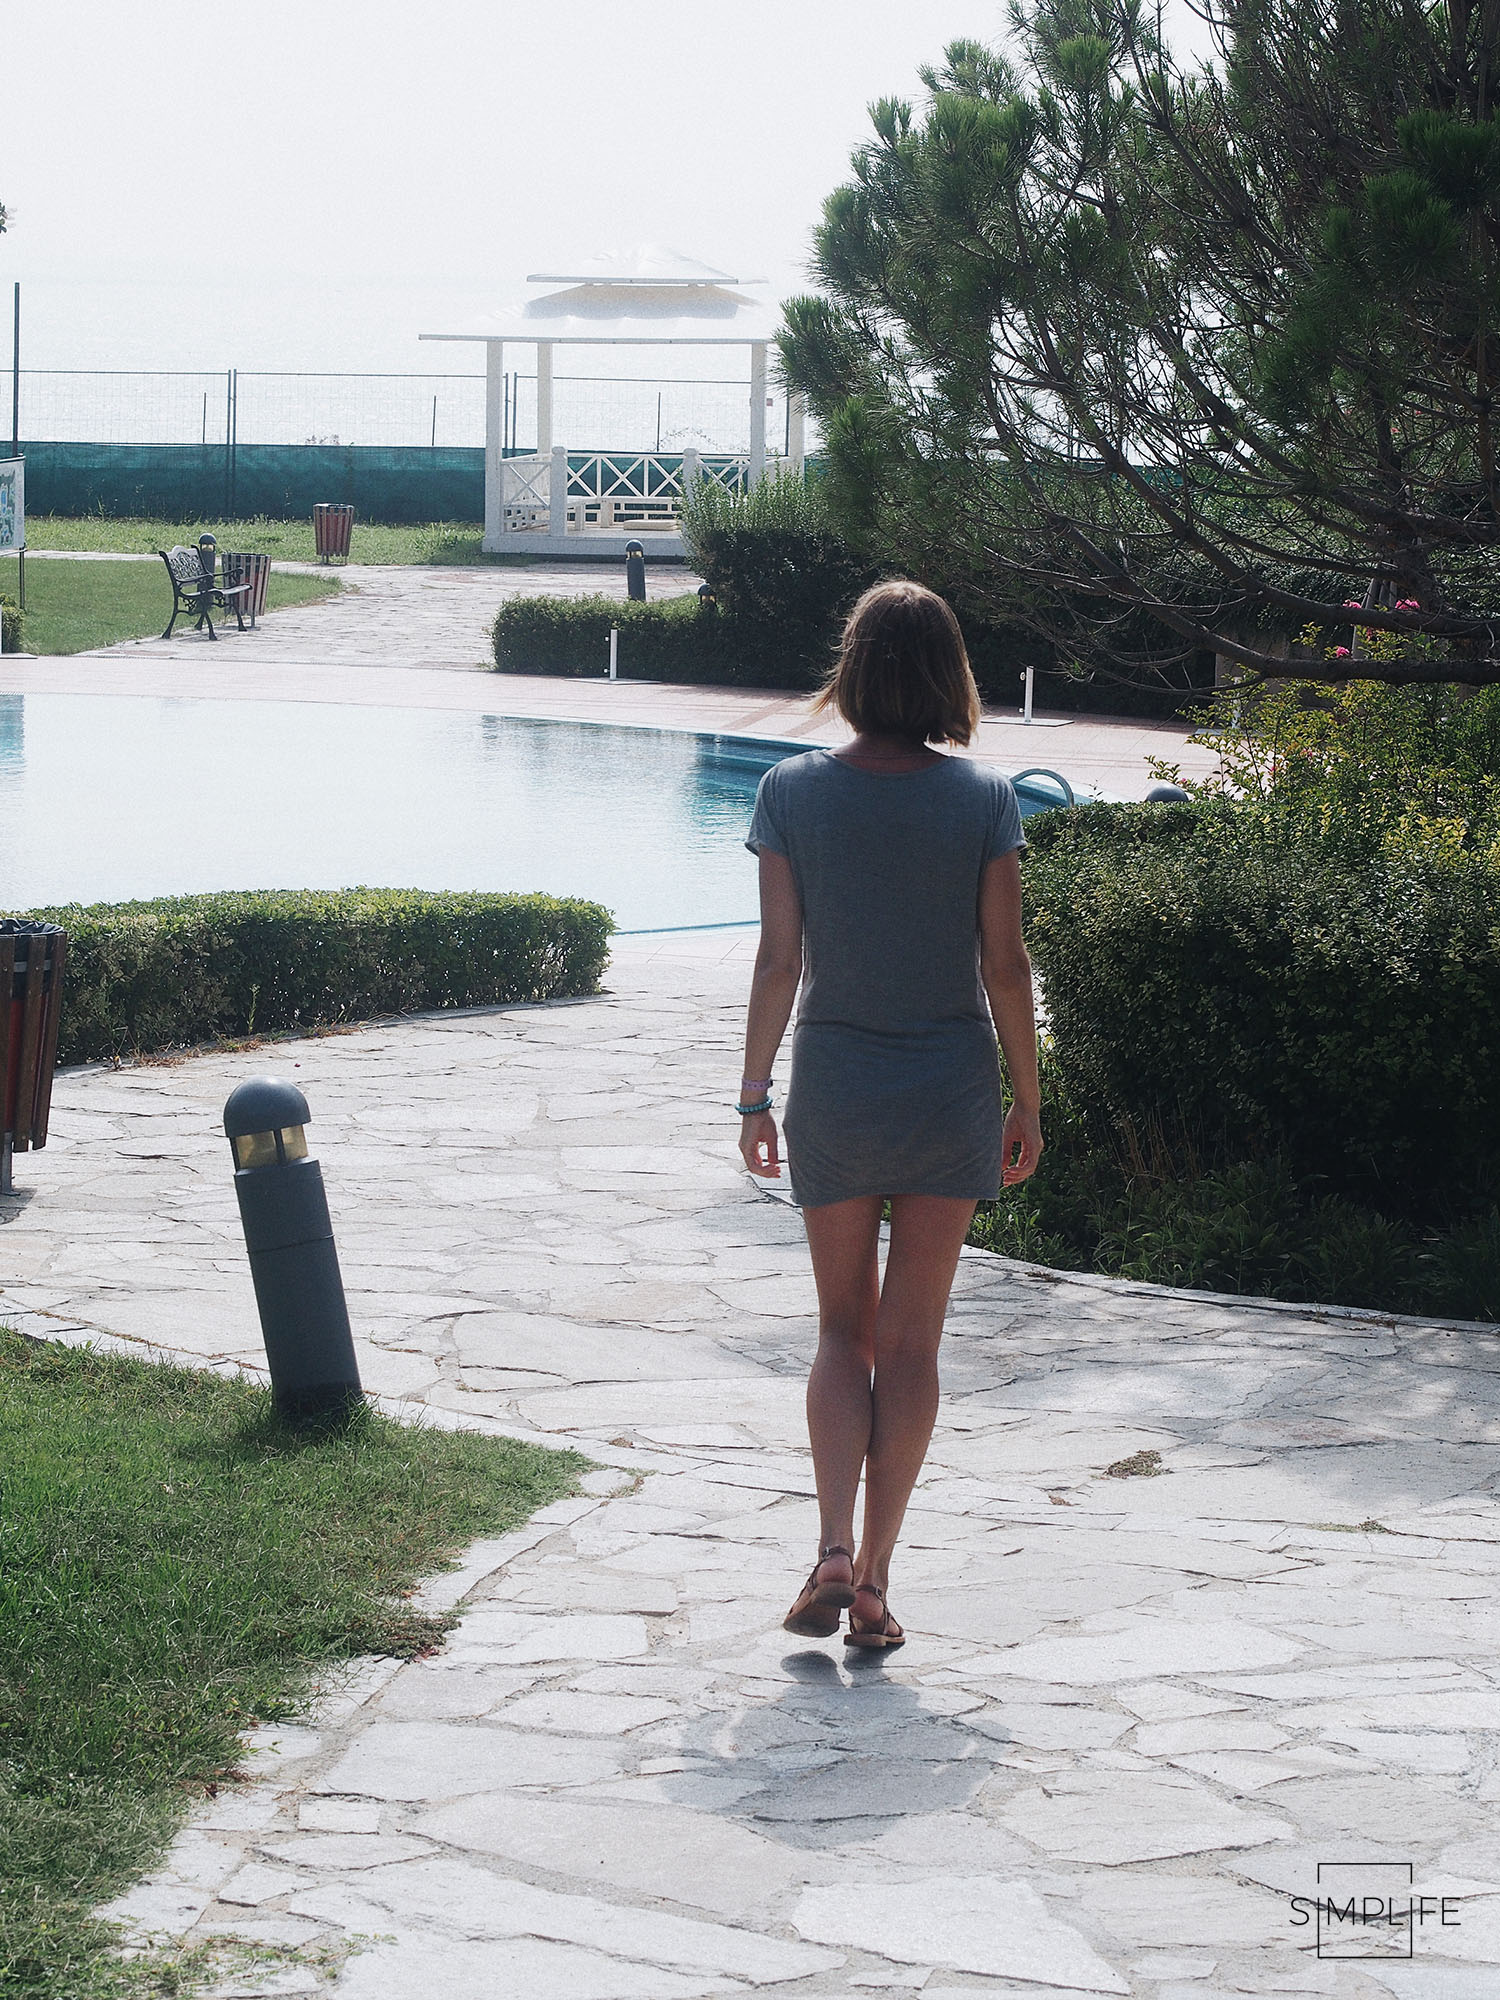 Bułgaria we wrześniu hotel